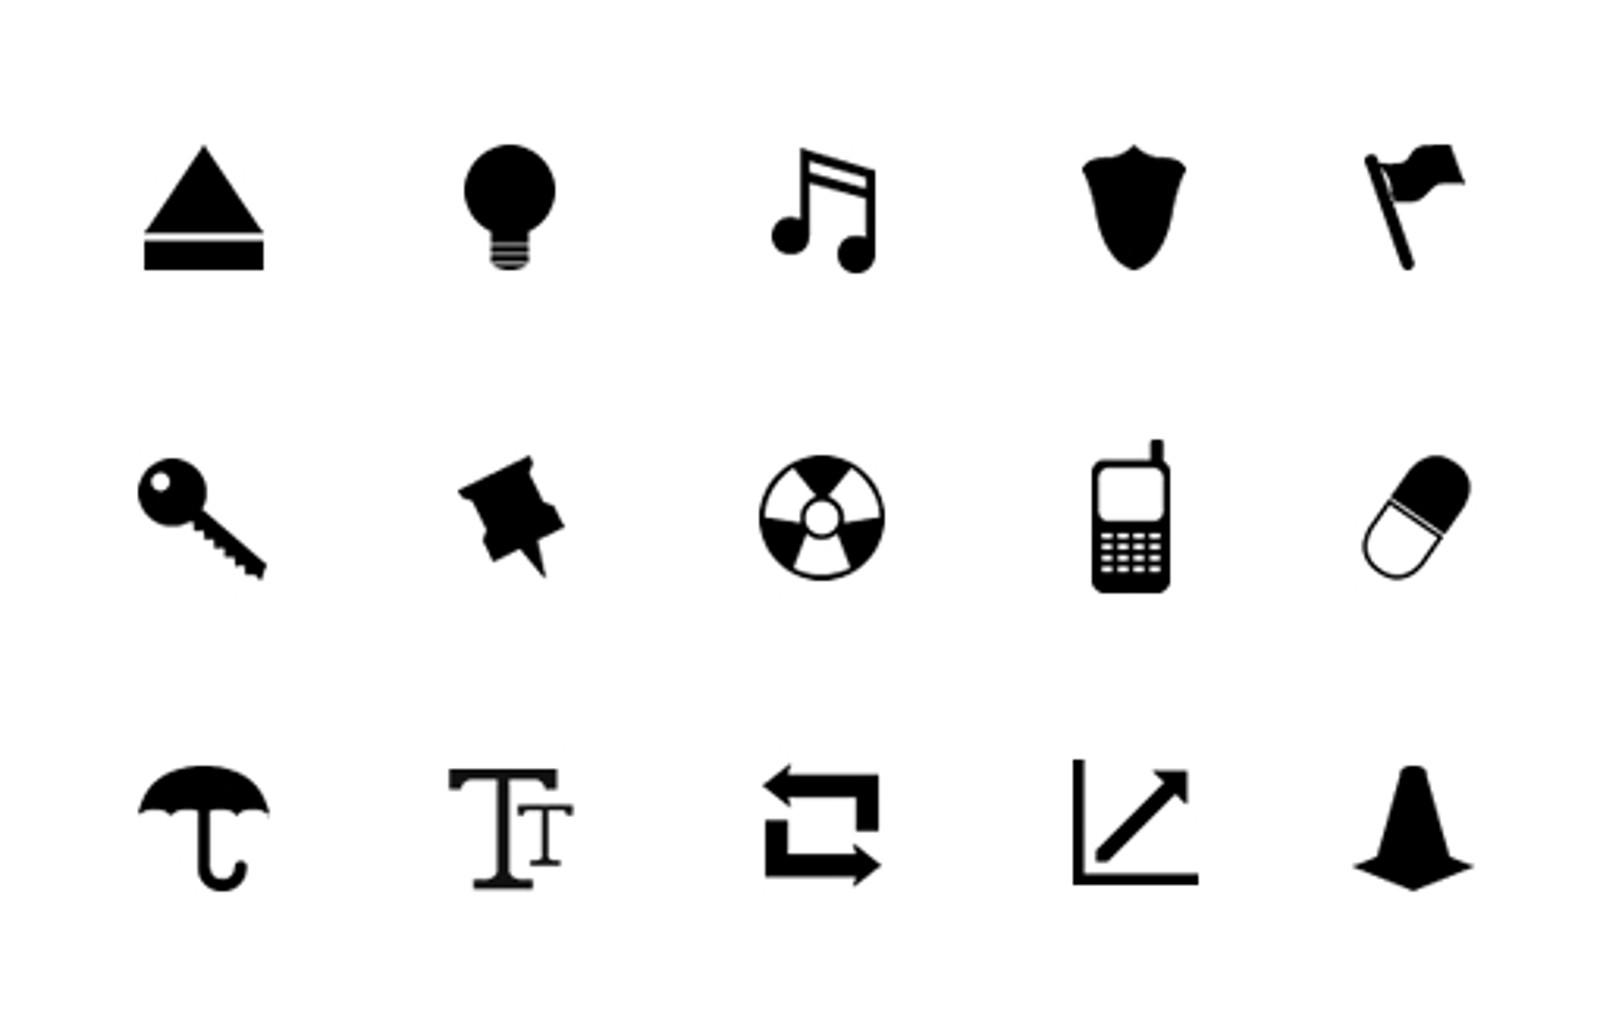 Symbols3